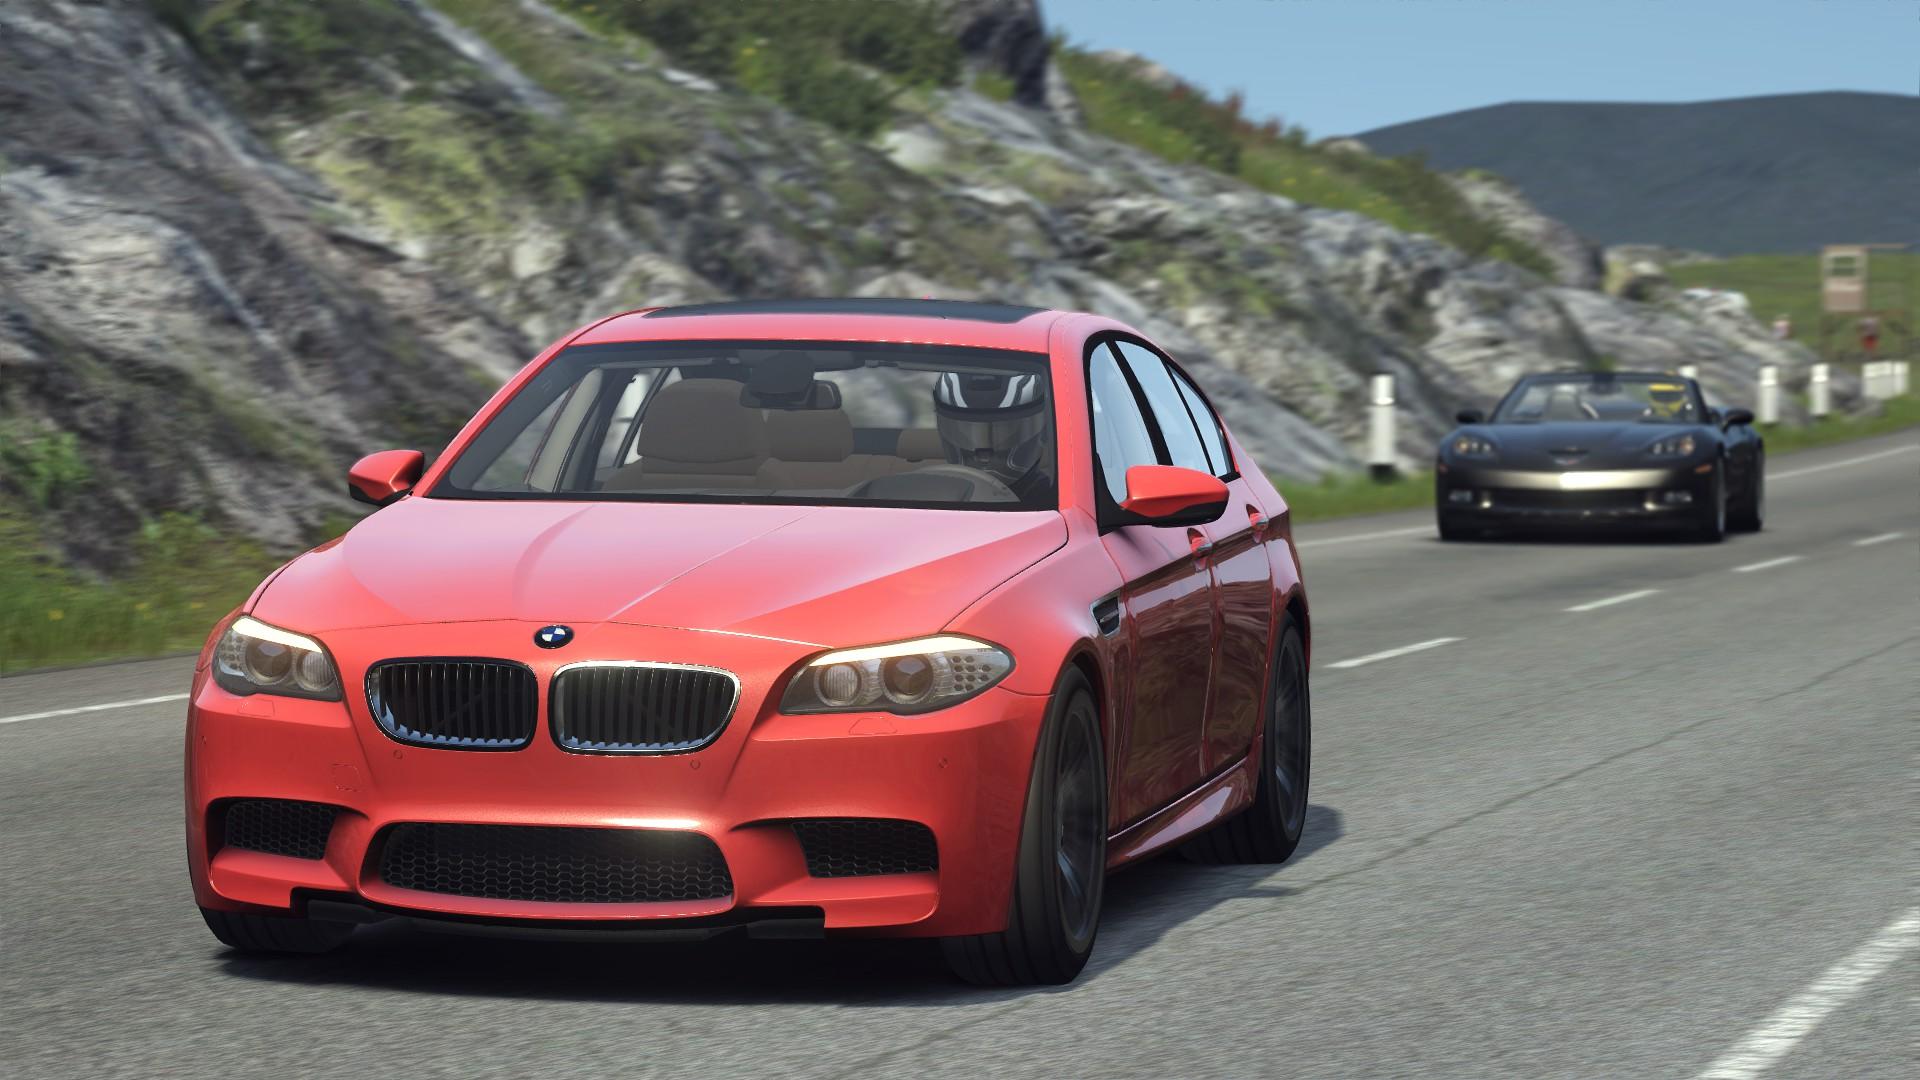 BMW M5 F10 Assetto Corsa 1.14 010.jpg